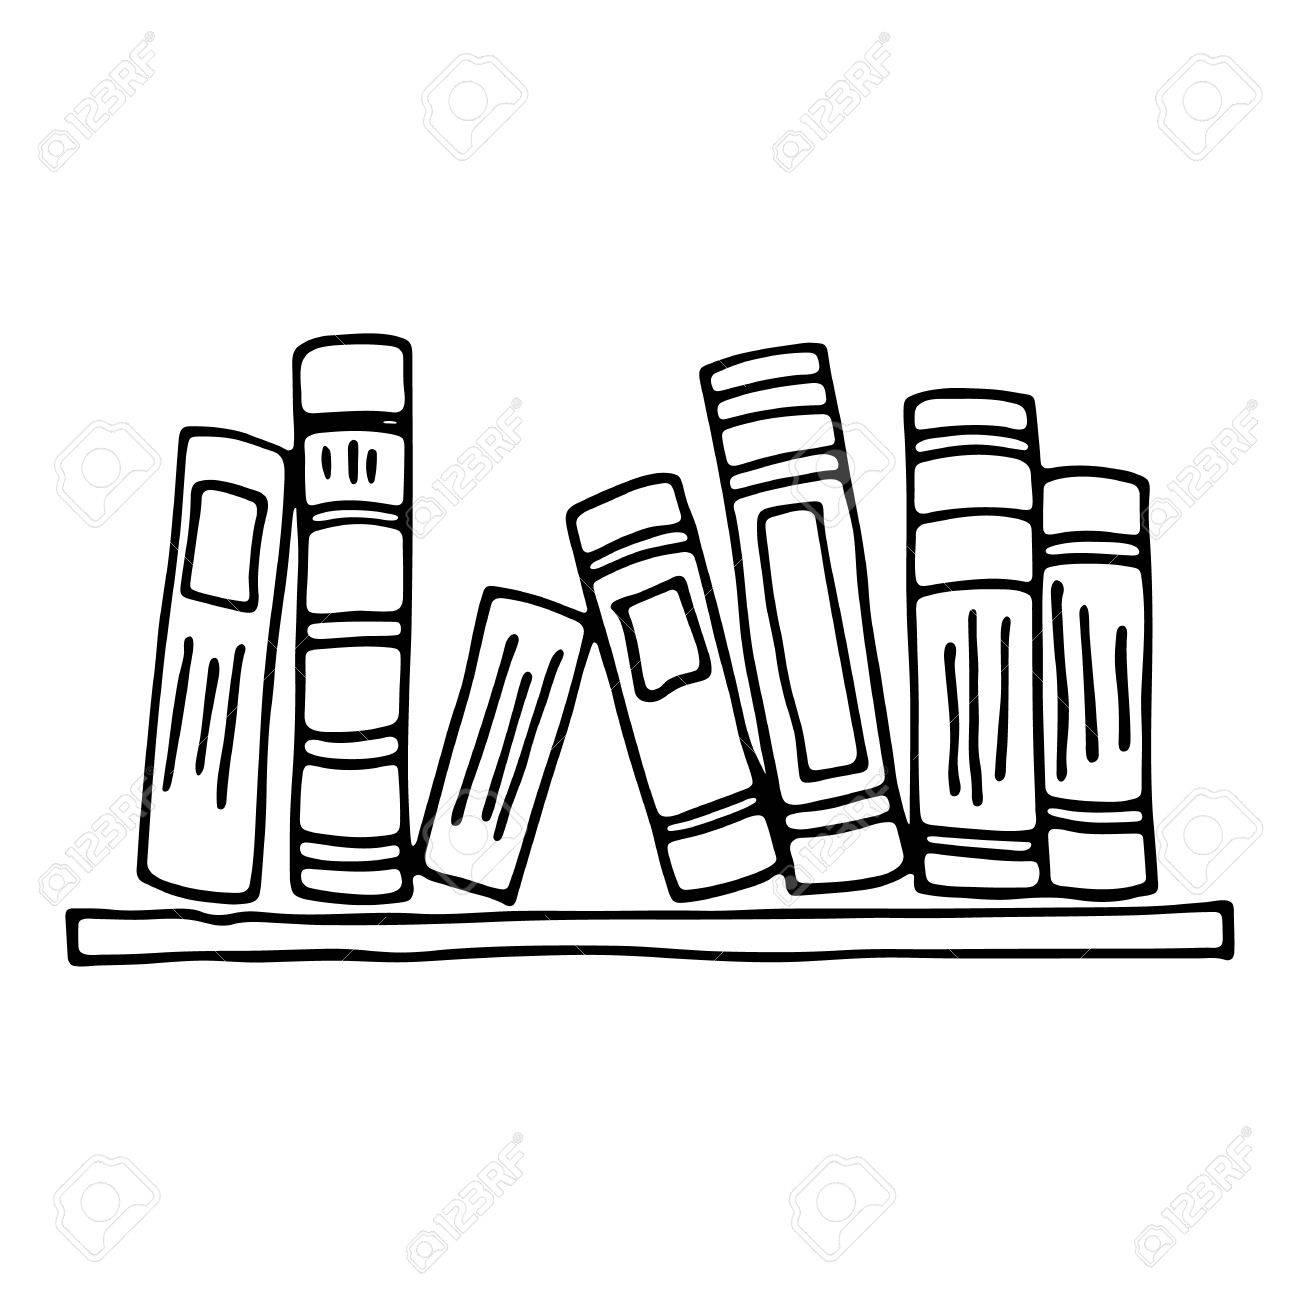 Books on the shelf isolated on white background.